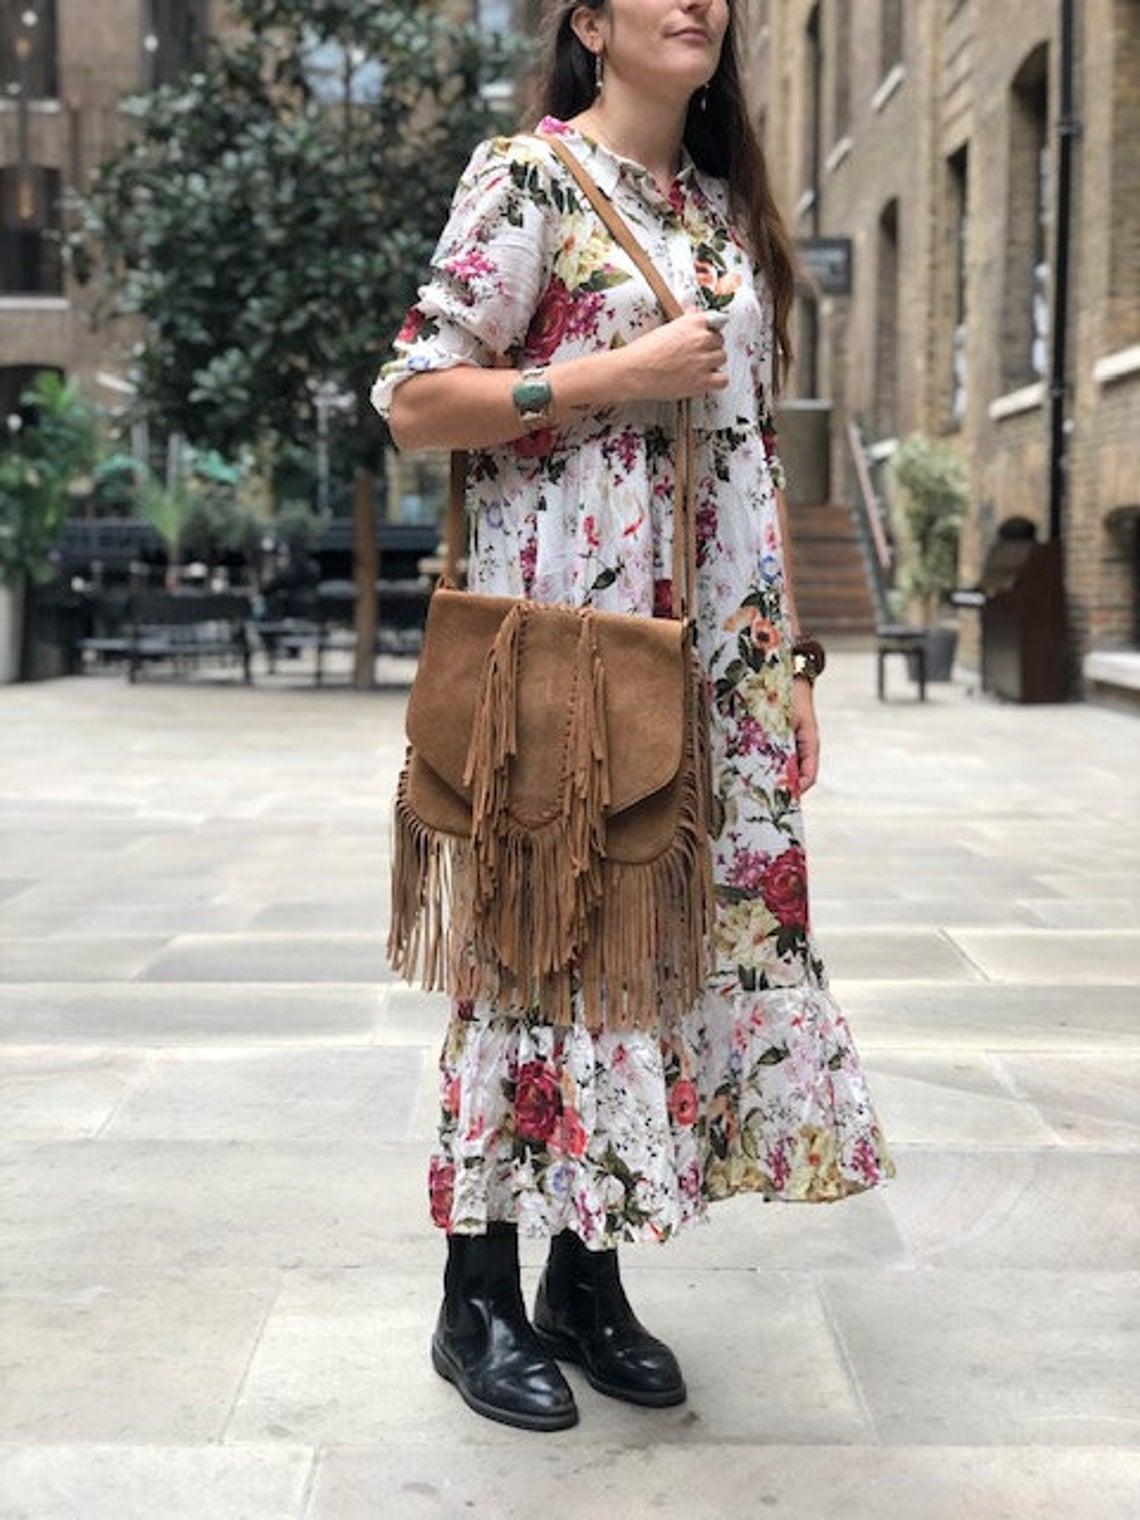 Braided FRINGE LEATHER BAG Tan - Hippie Suede Tassel Handbag | Ethnic Boho Purse | Large Bohemian Satchel | Western Leather Bag